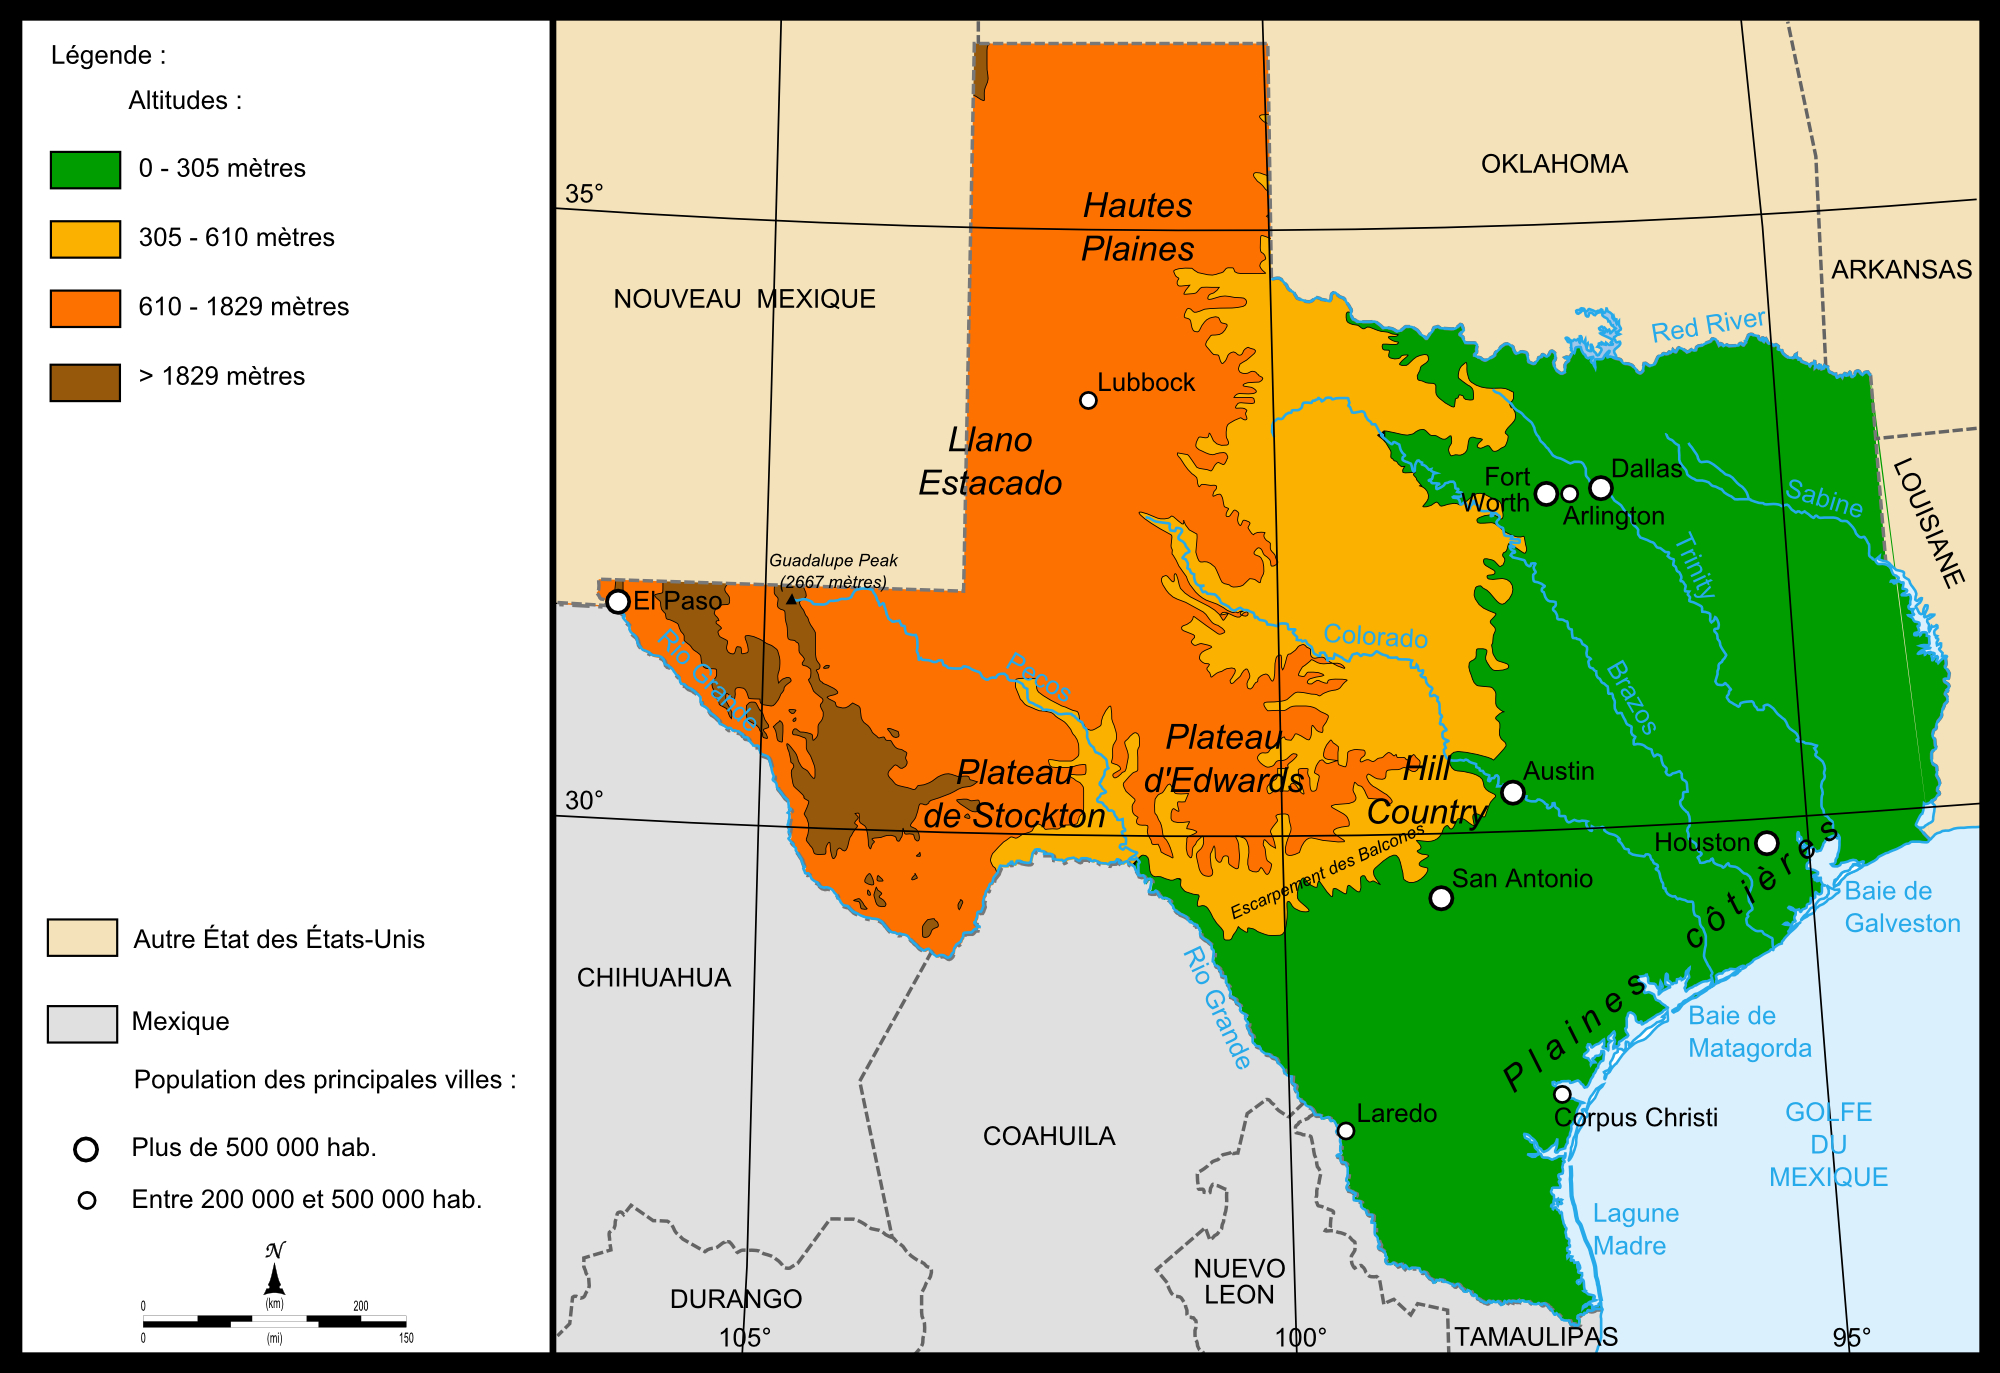 Elevation Map Of Texas_ – Kingjaap - Texas Elevation Map